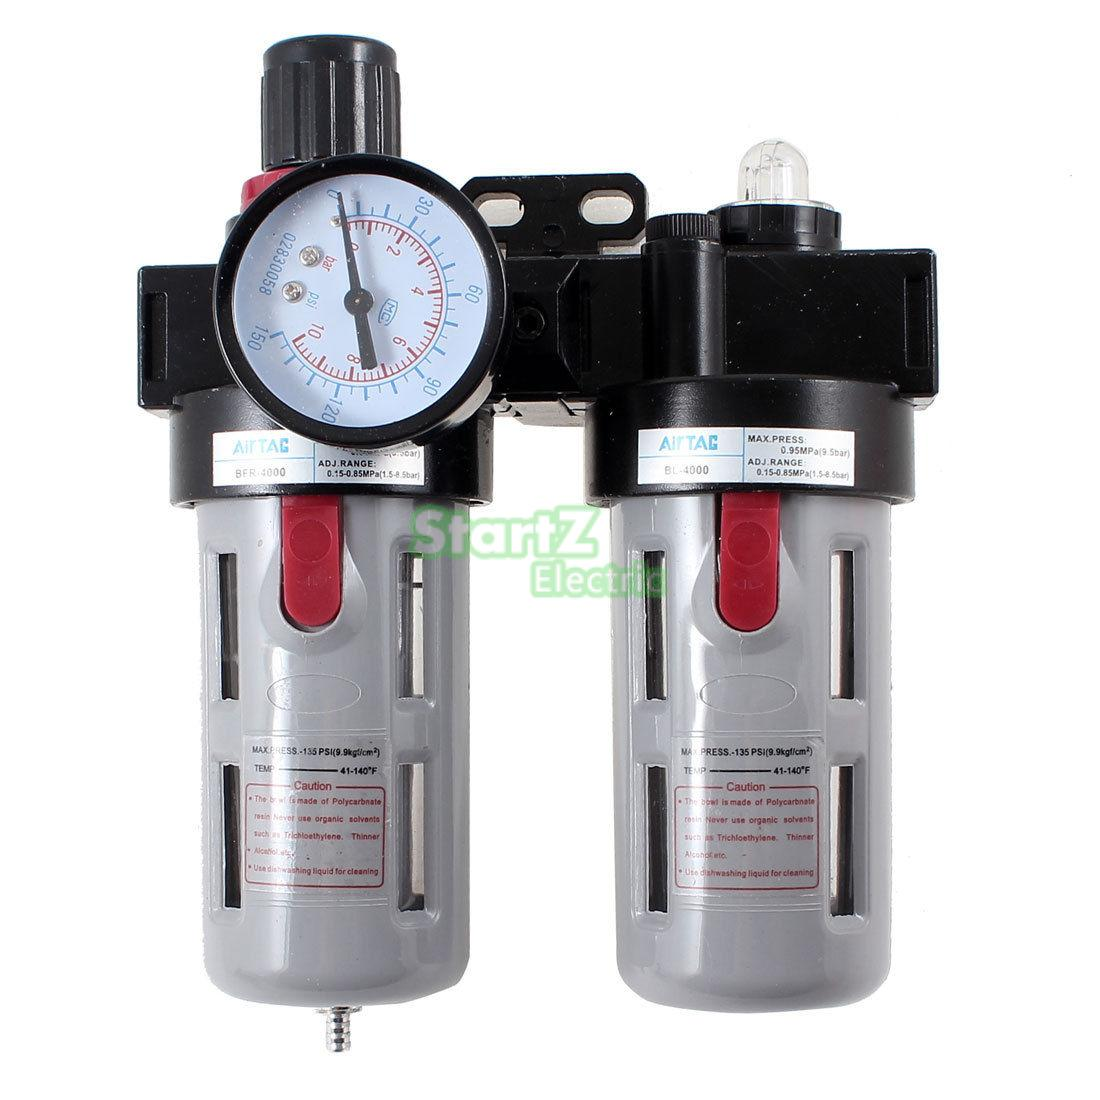 BFC4000 Air Source Treatment Filter Regulator Lubricator Combination